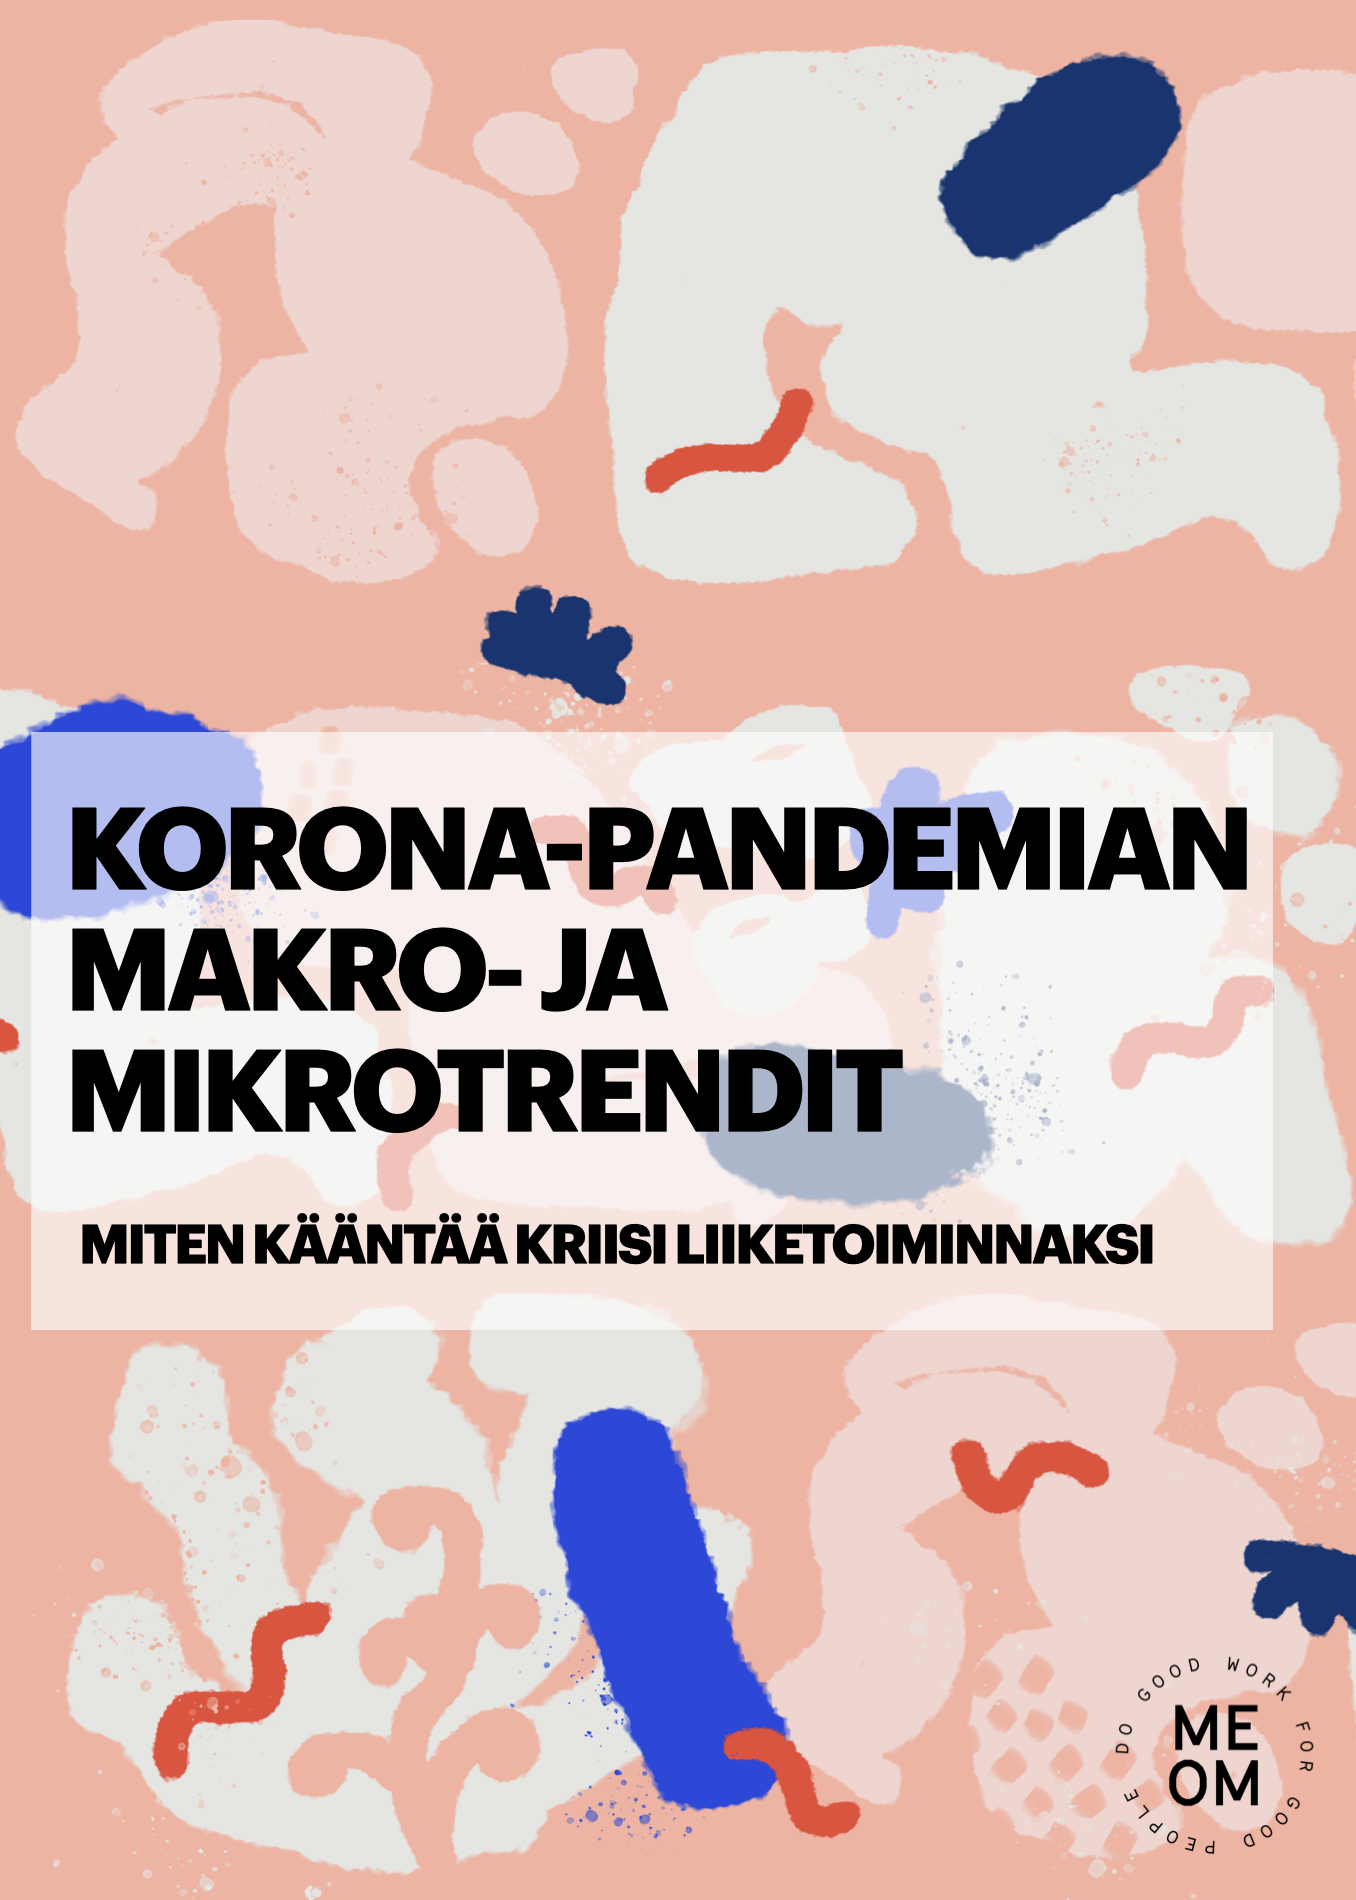 Koronapandemian makro- ja mikrotrendit.001